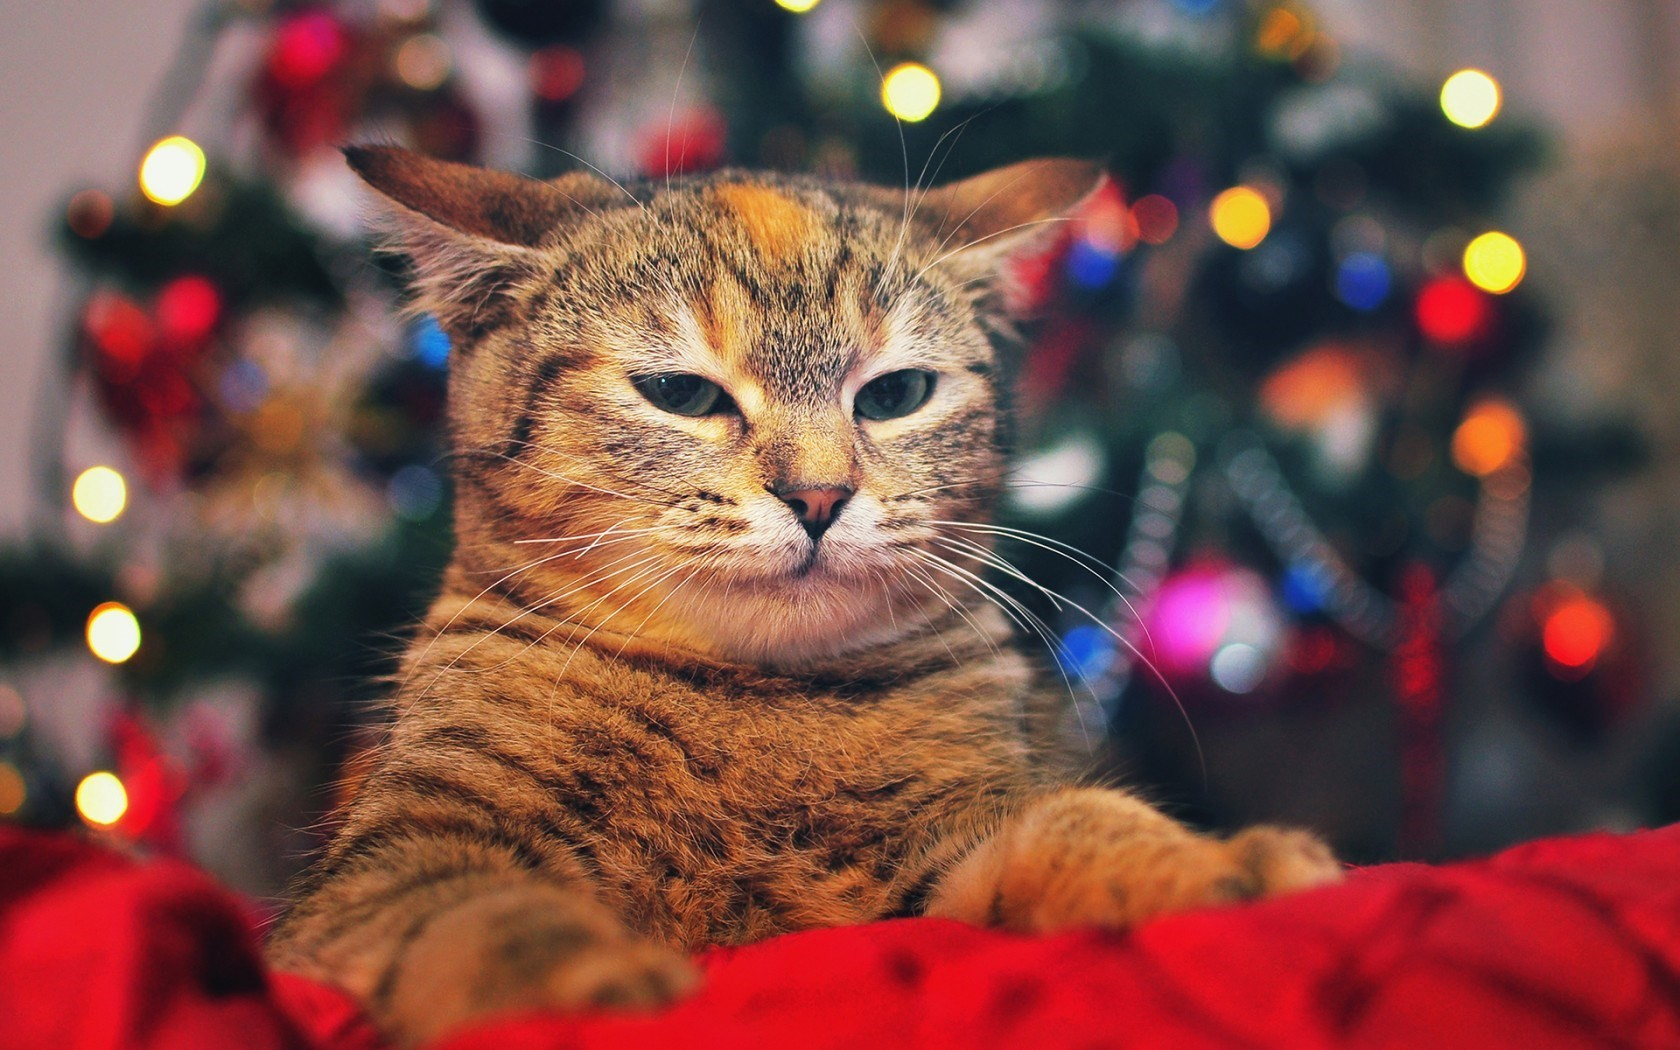 Cat Christmas Tree Lights HD Wallpaper - FreeWallsUp